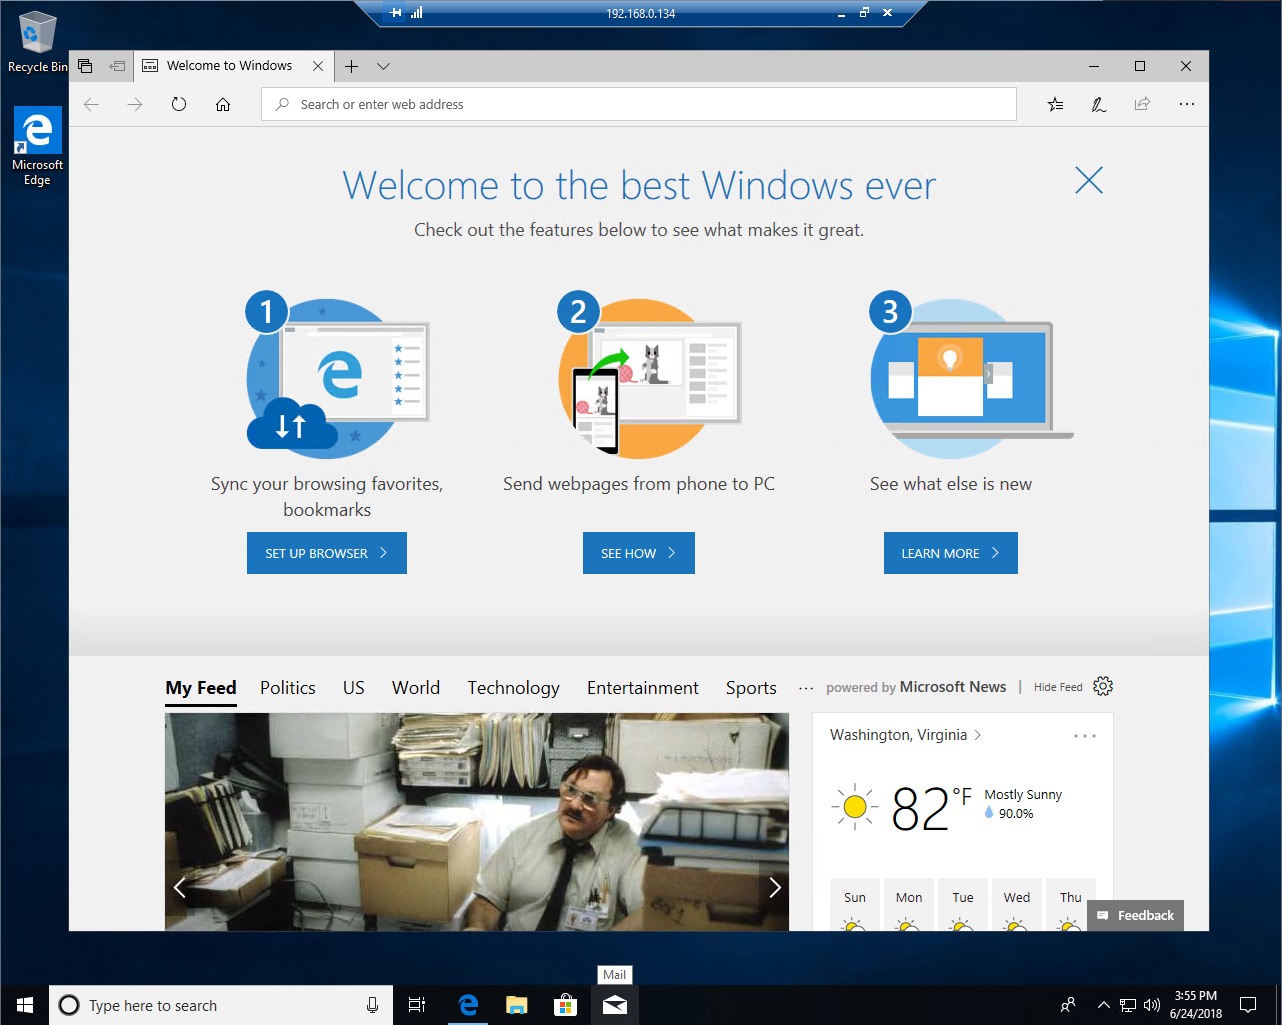 Microsoft Azure - Windows 10 VM